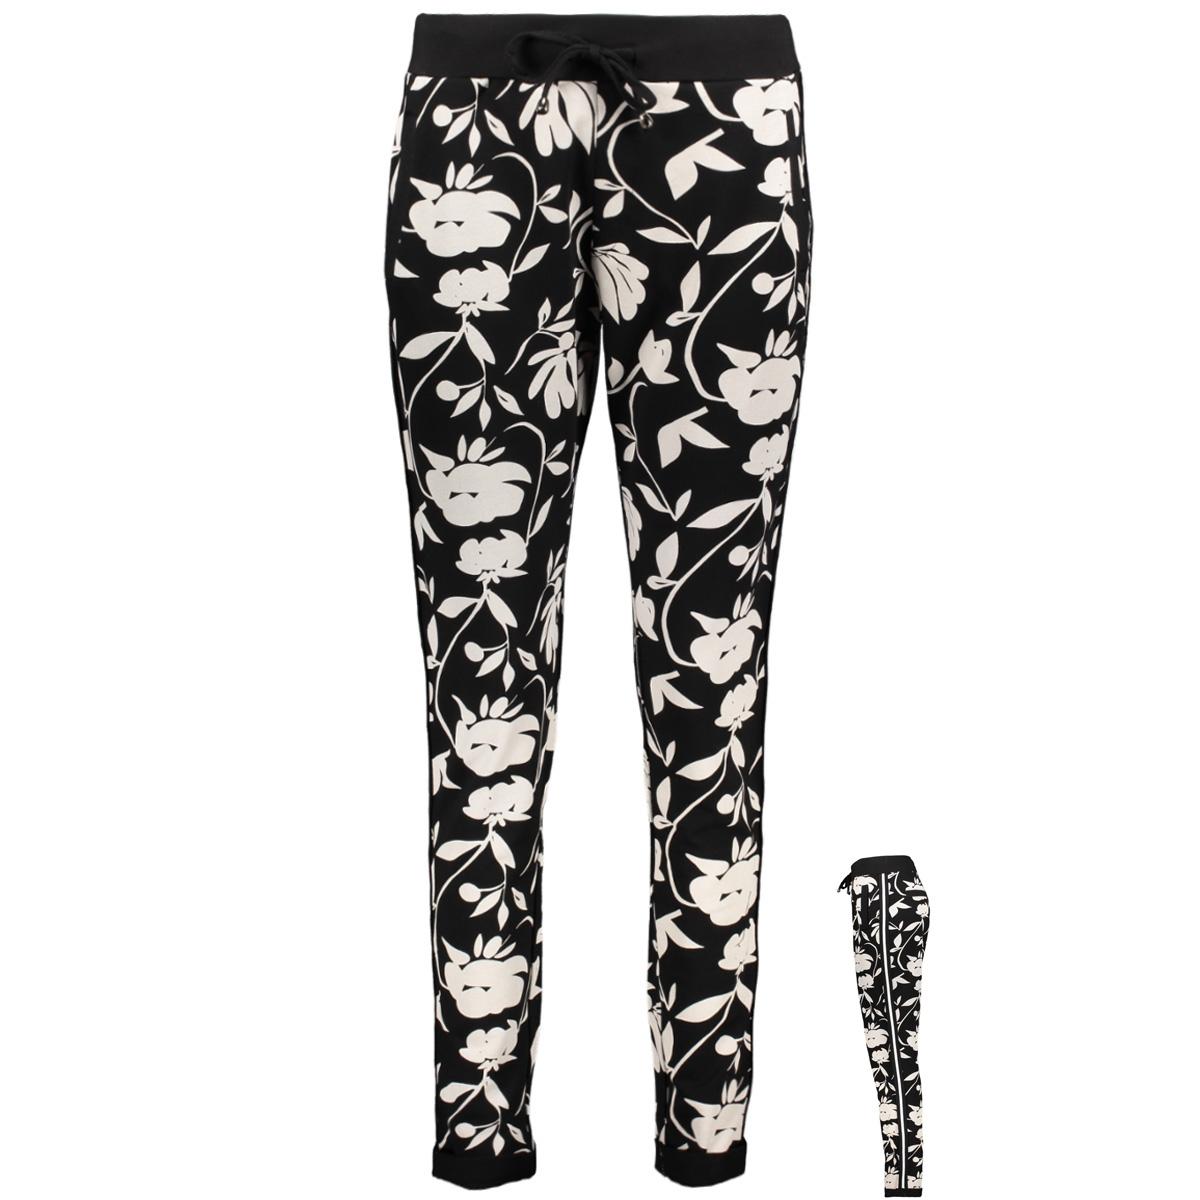 tully 194 sweat trouser zoso broek black/offwhite